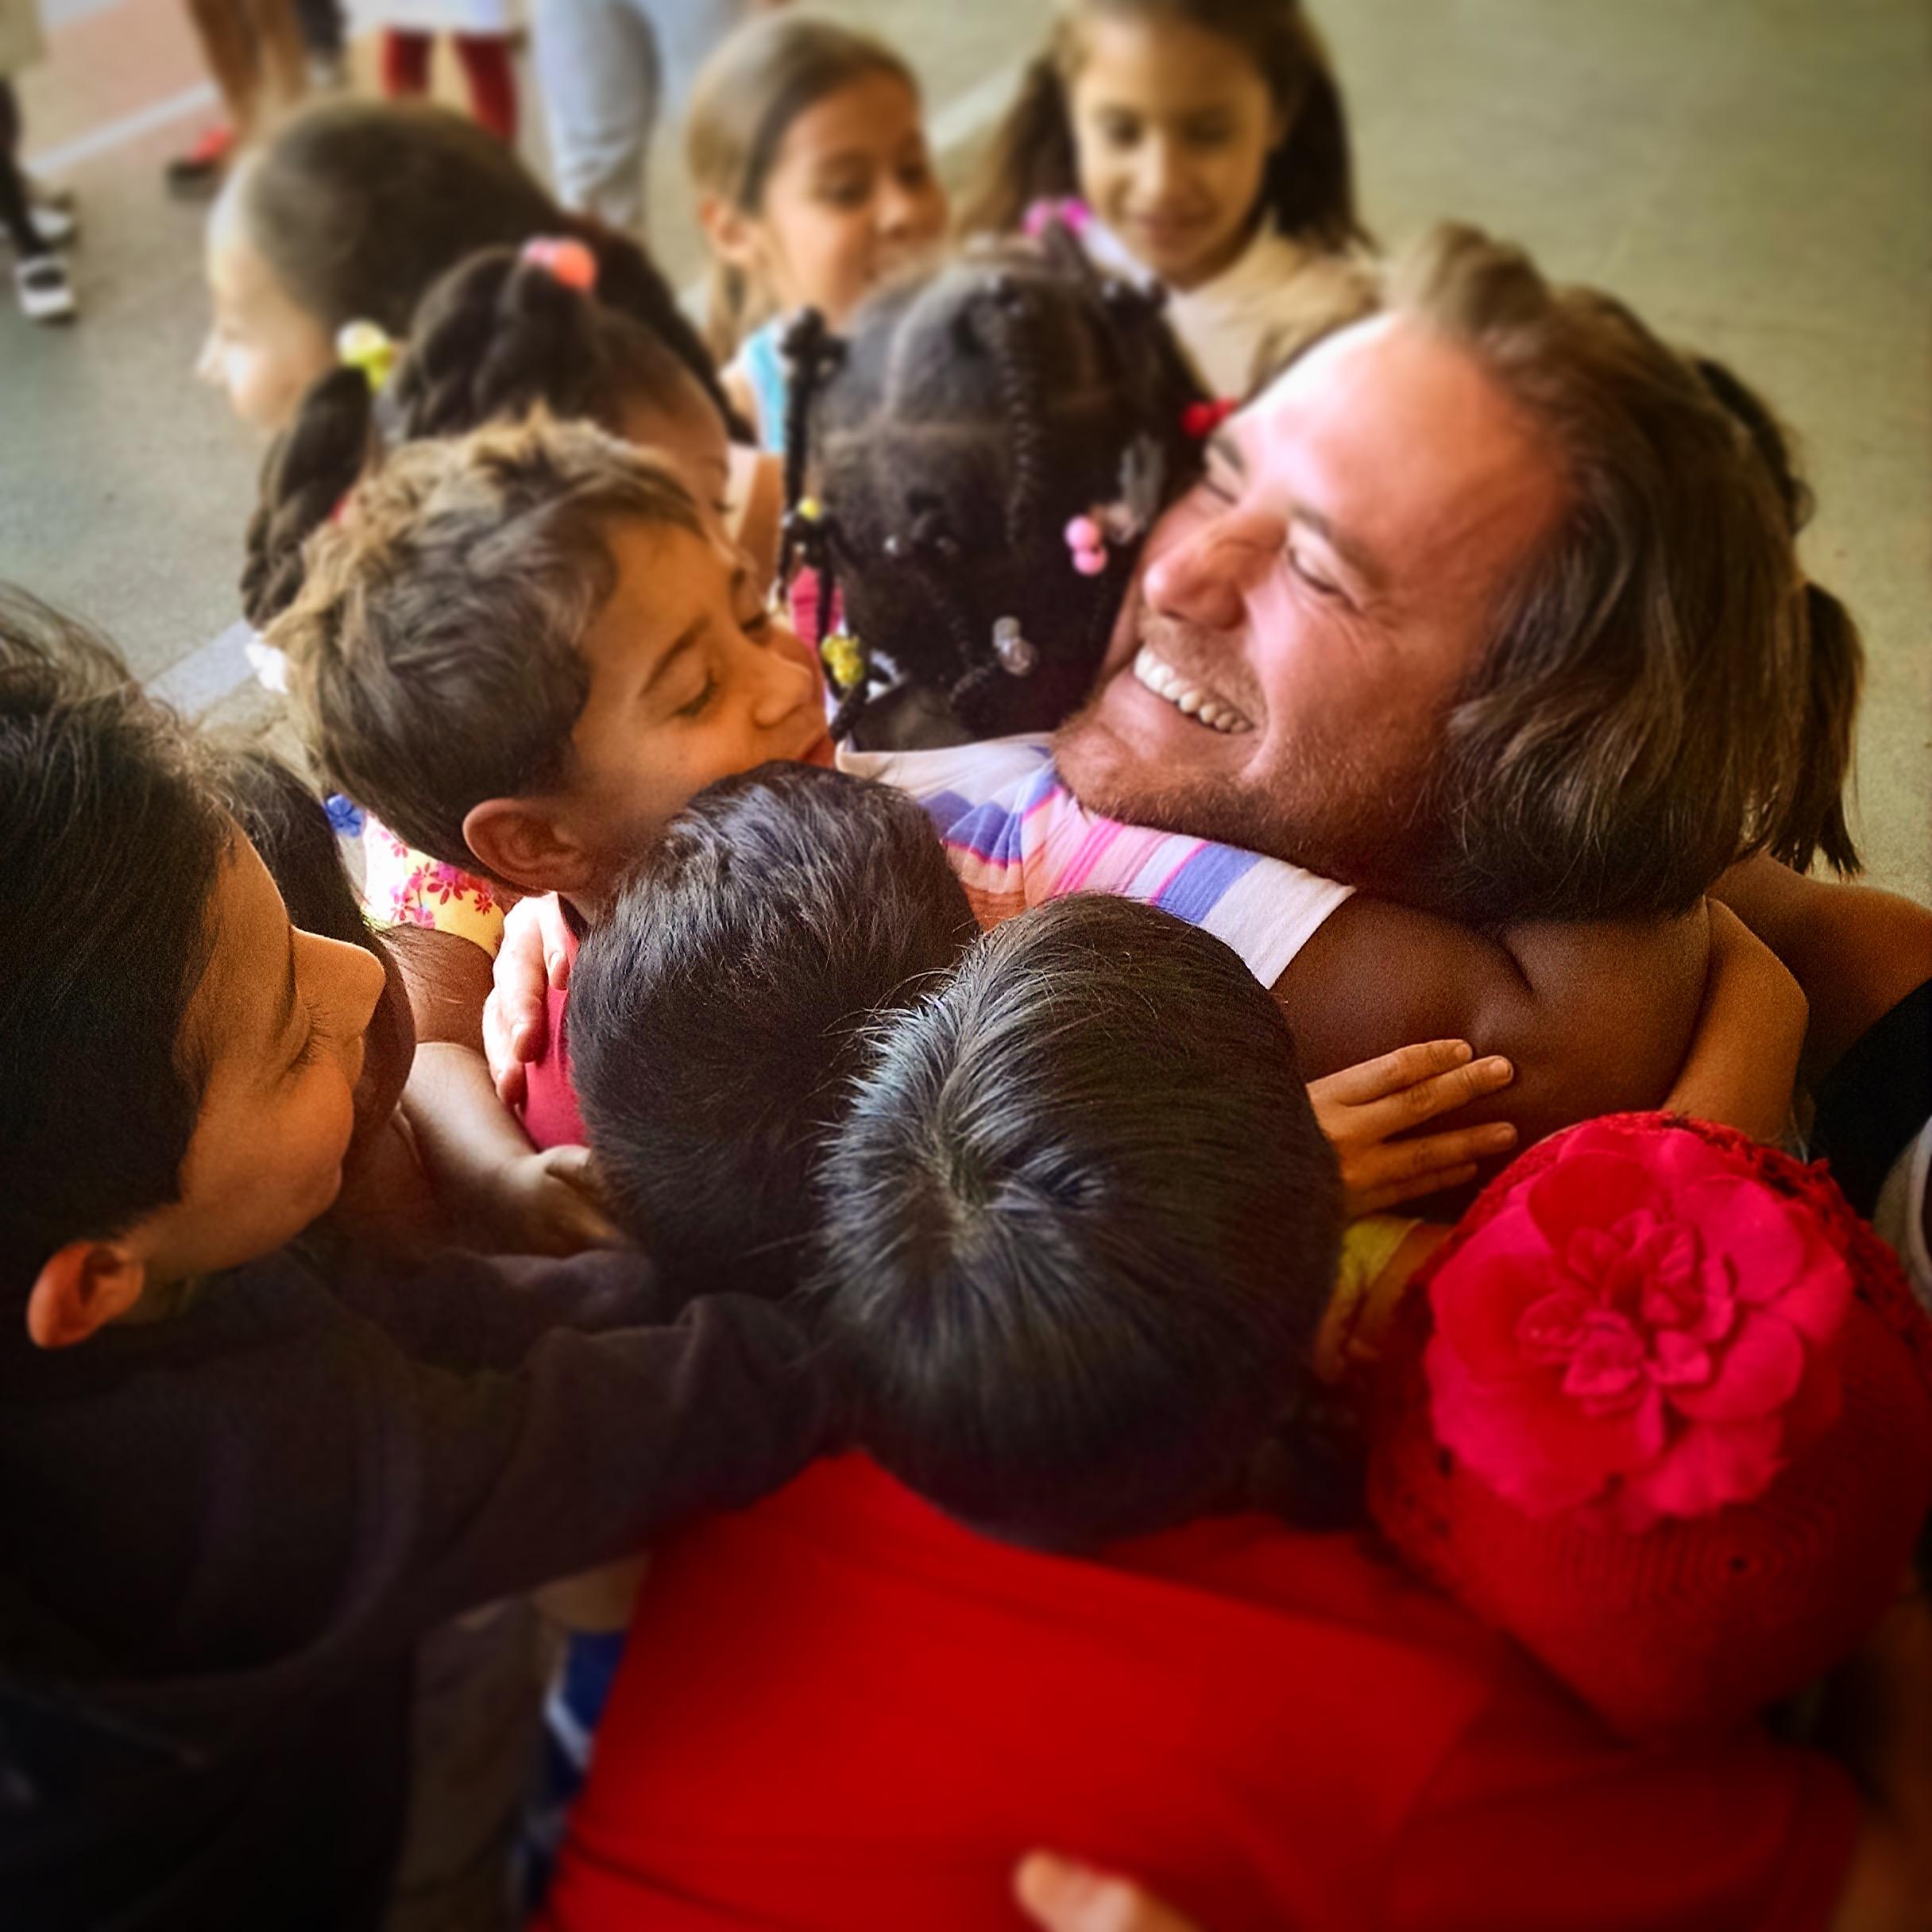 Justin Wolff and Yoobi Kids